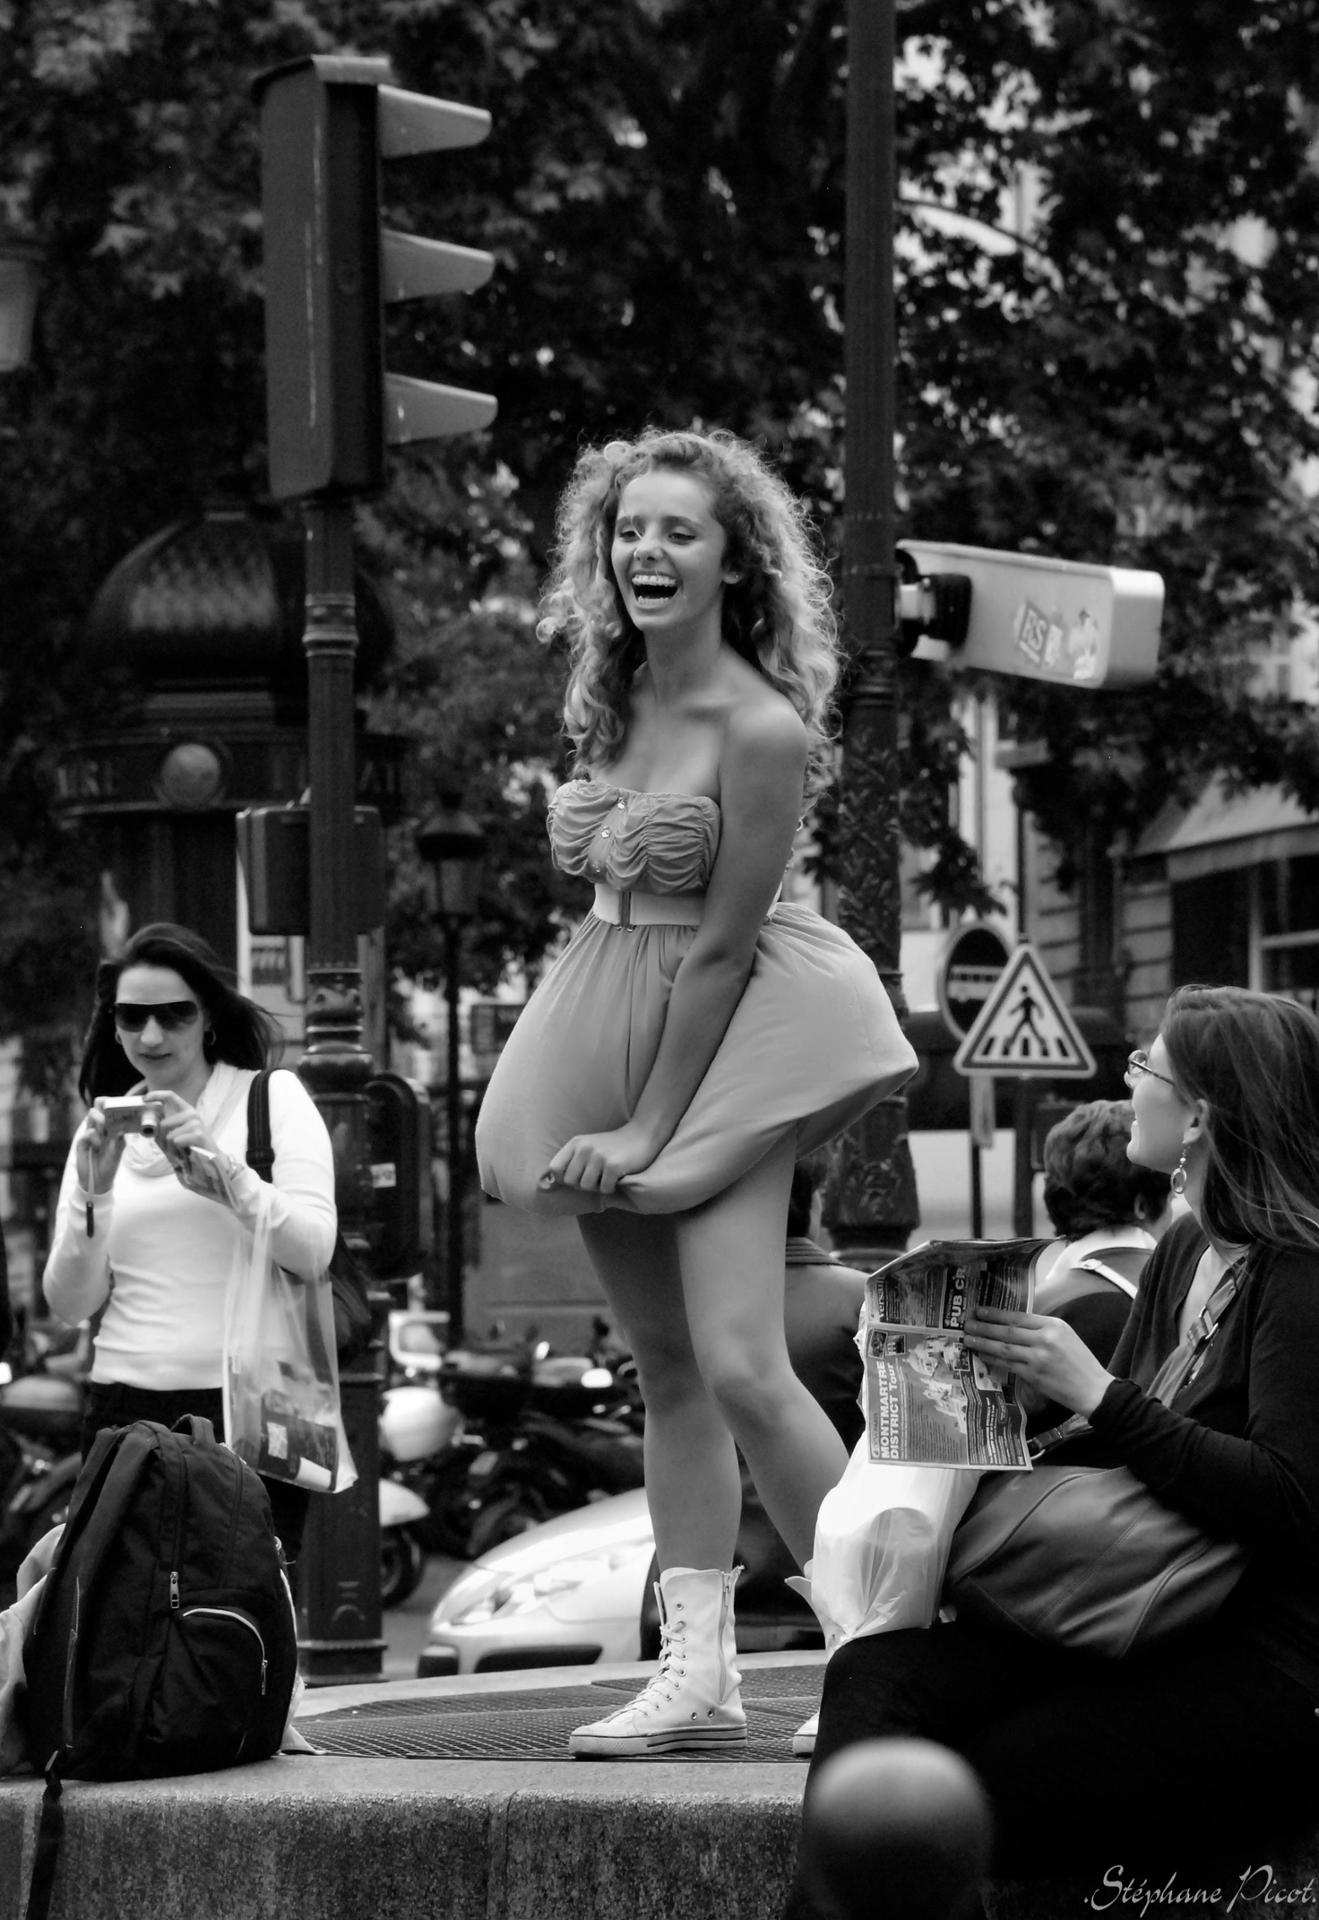 Façon Marilyn